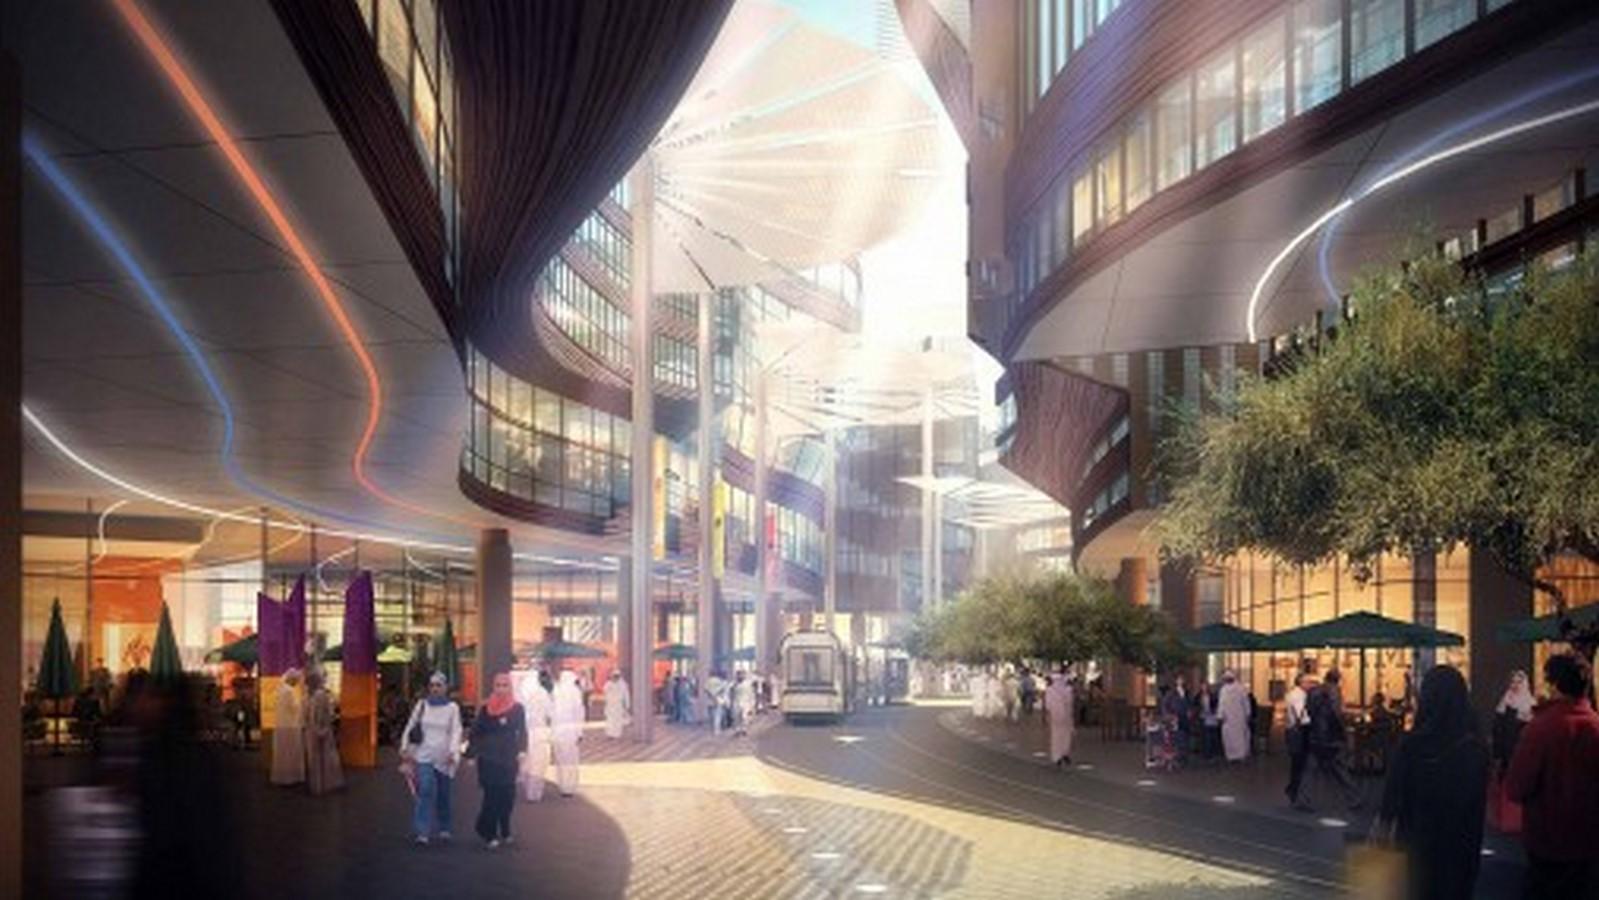 Gensler- 10 Cities & Urban Design Projects Sheet21